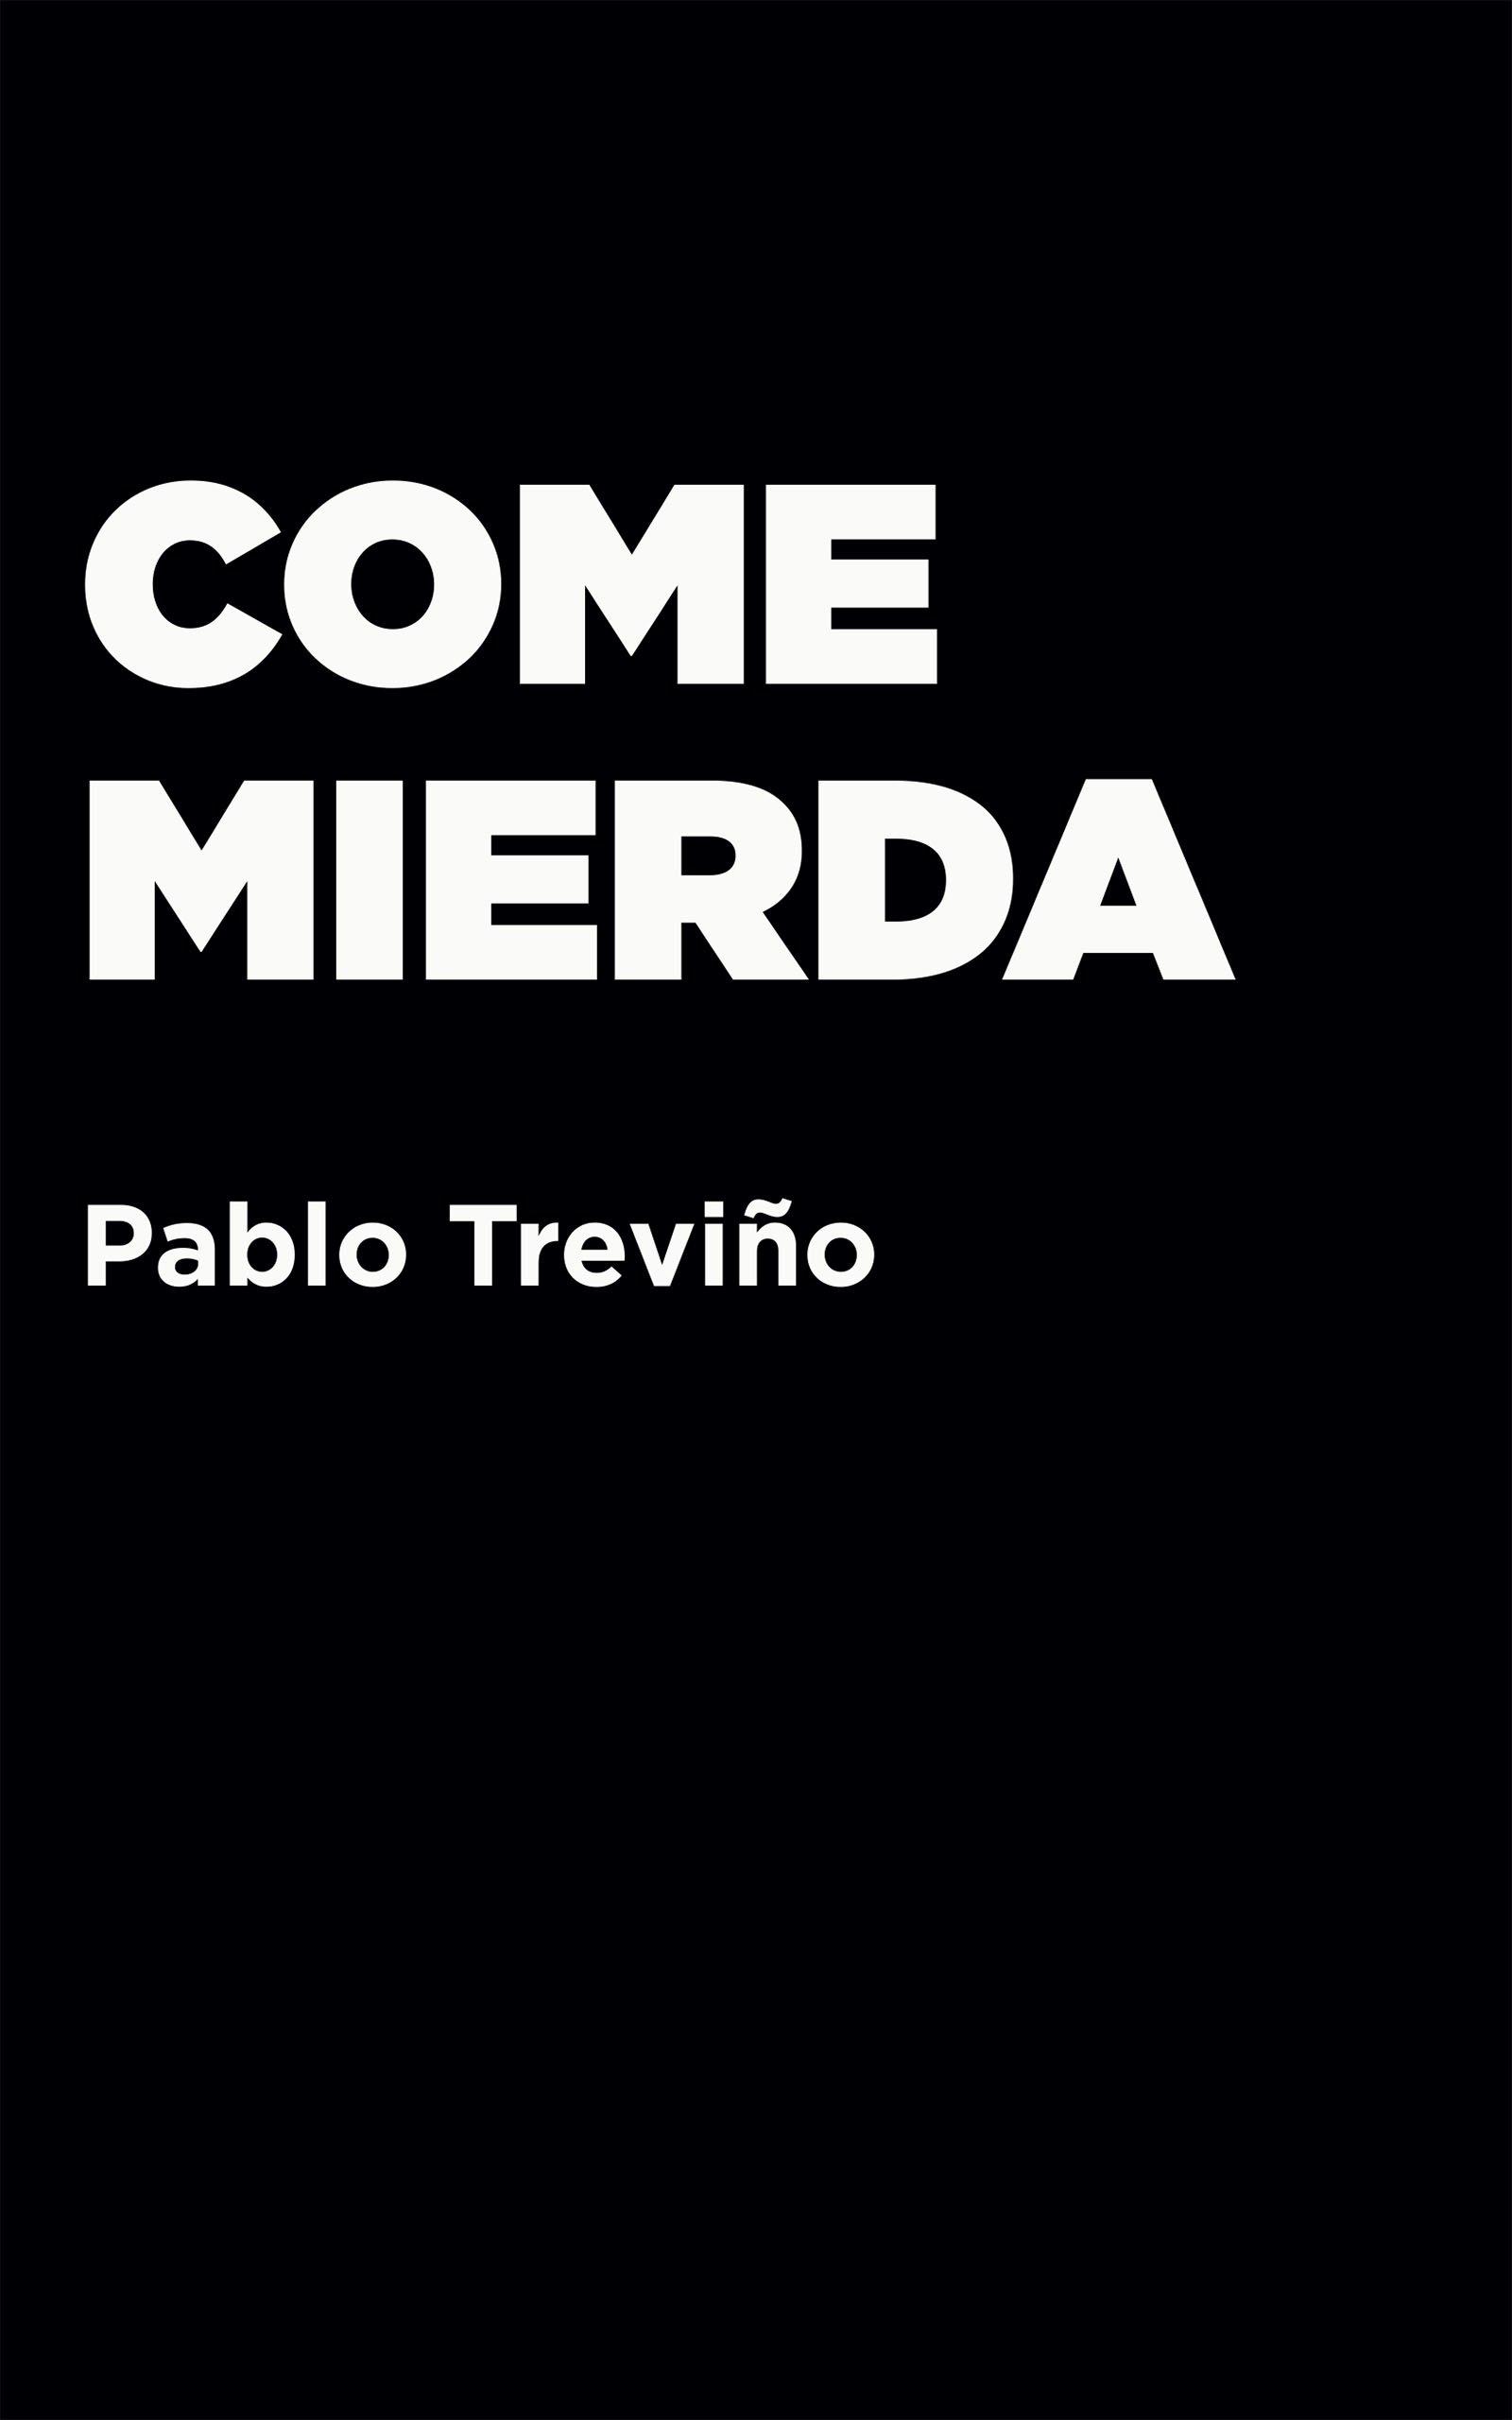 Come mierda, de Pablo Treviño